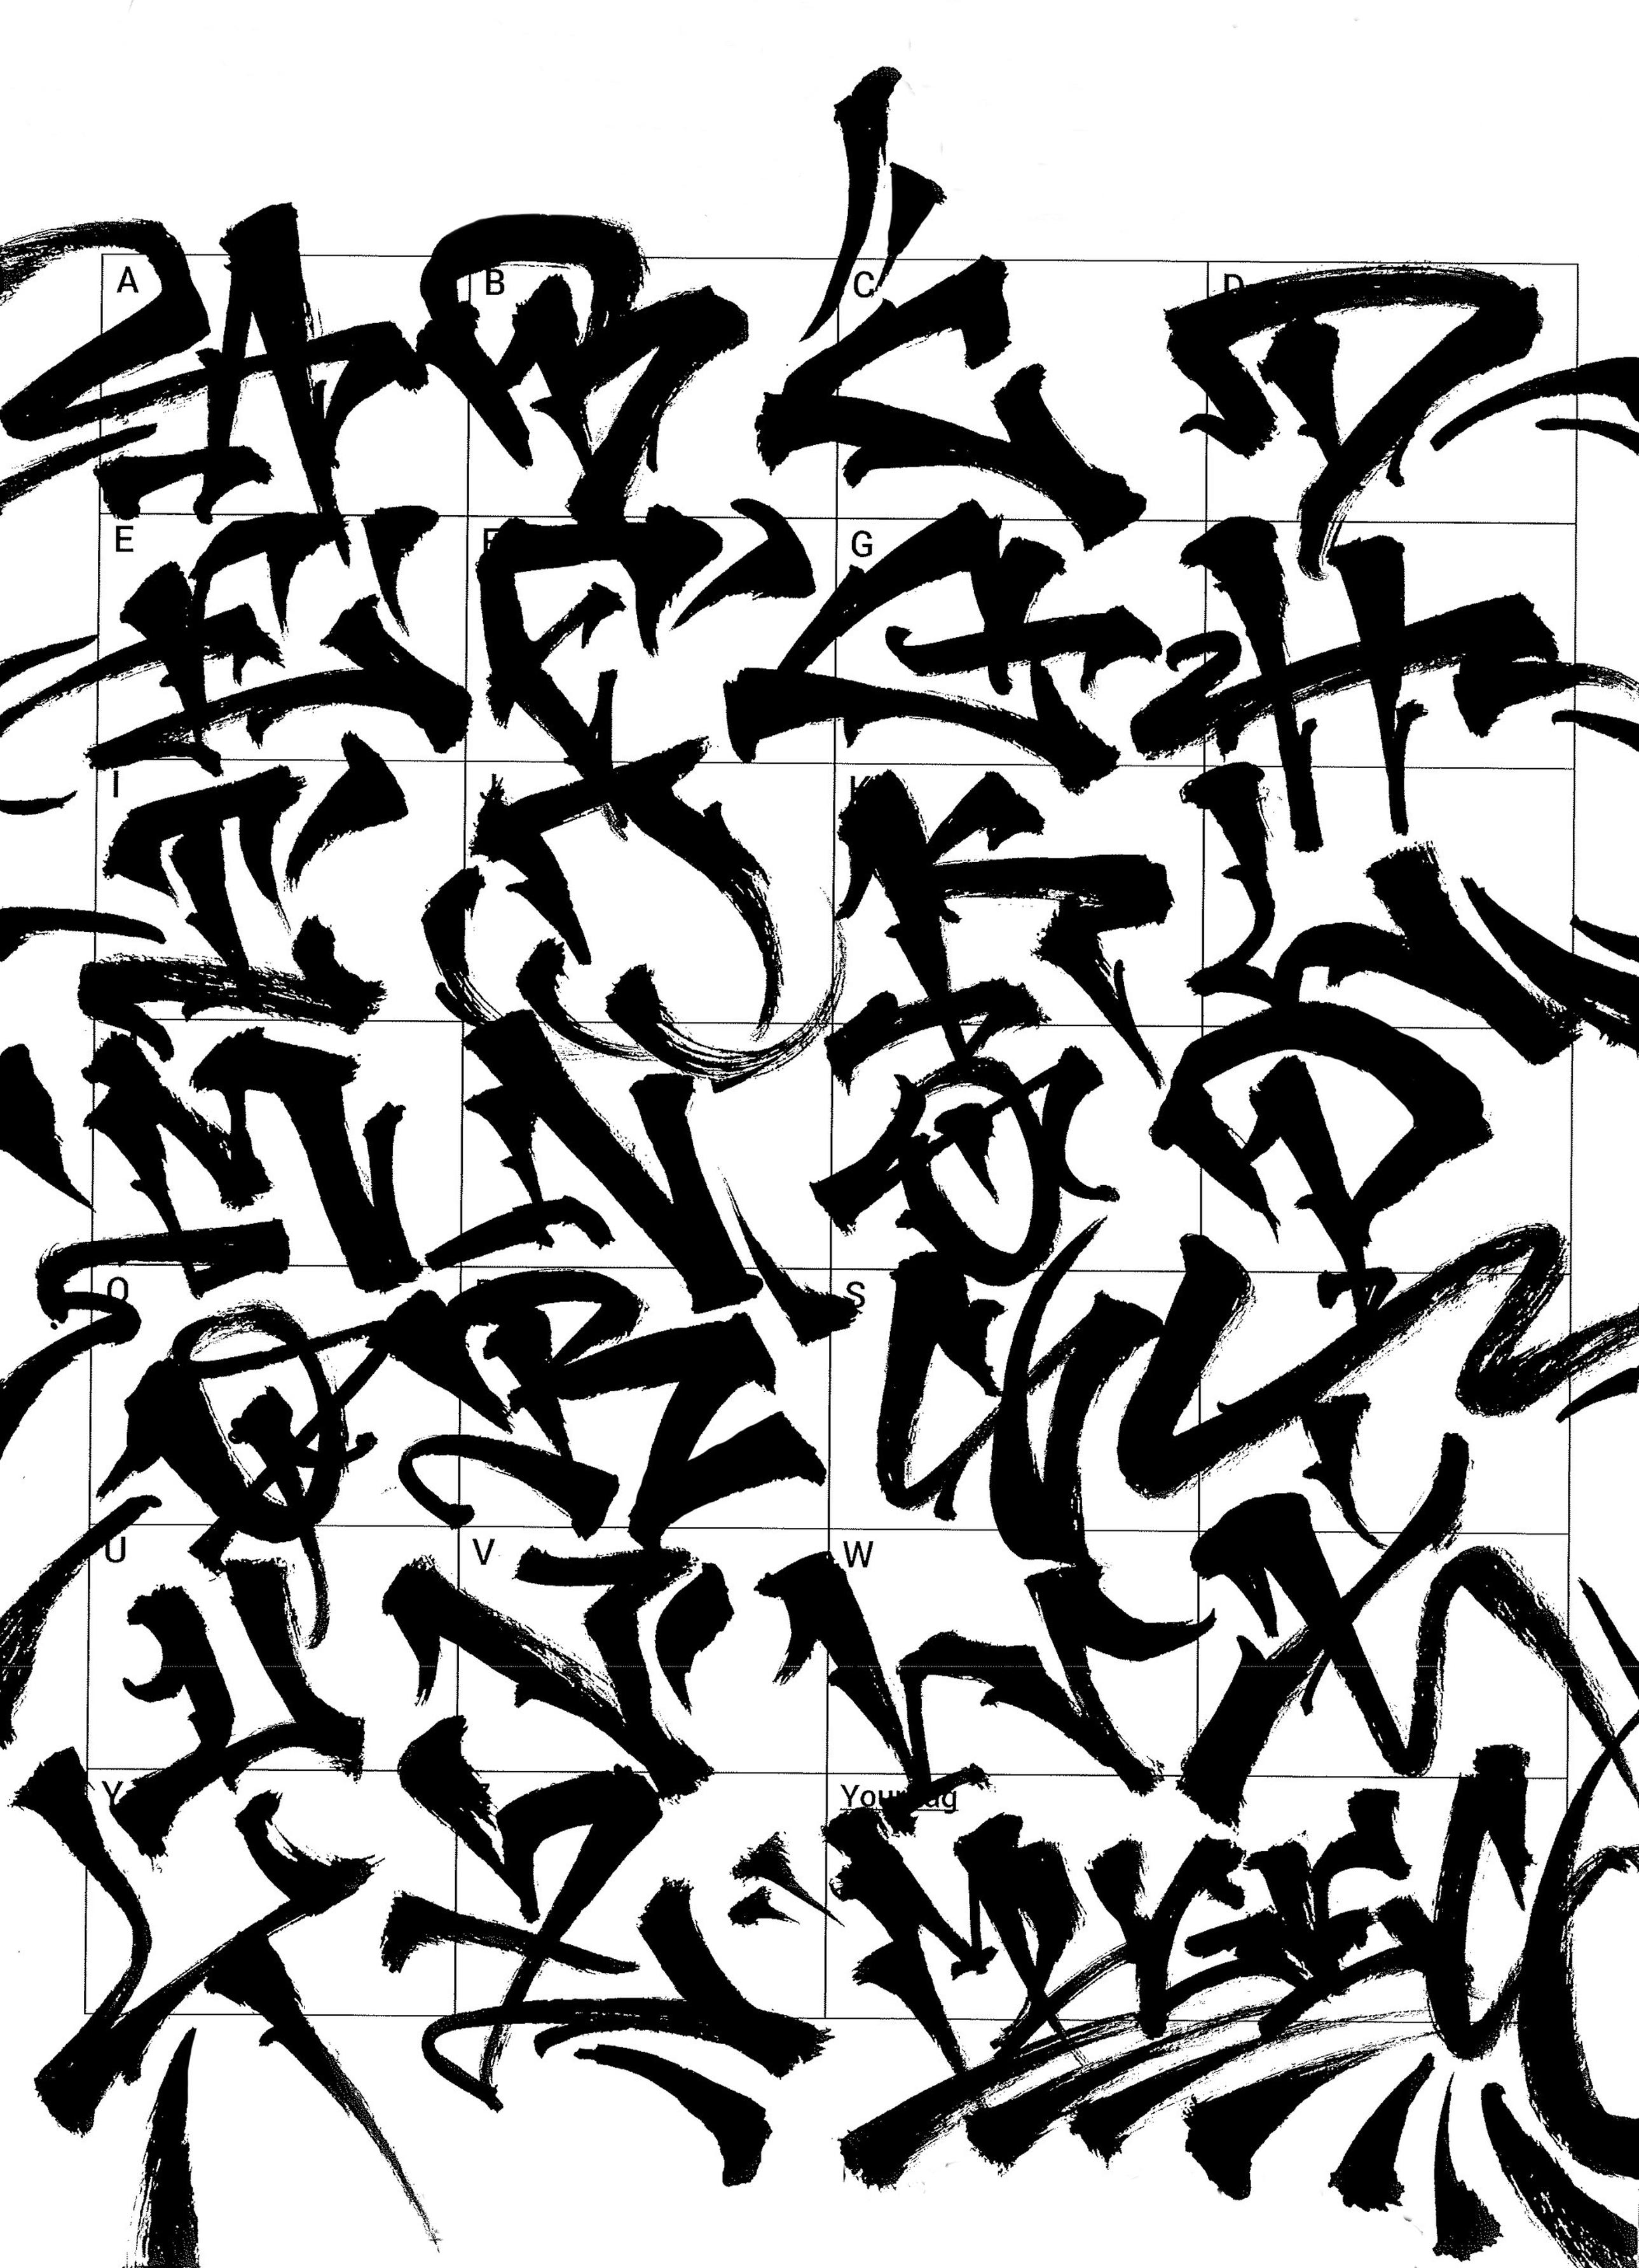 Graffiti Letters 61 Graffiti Artists Share Their Styles